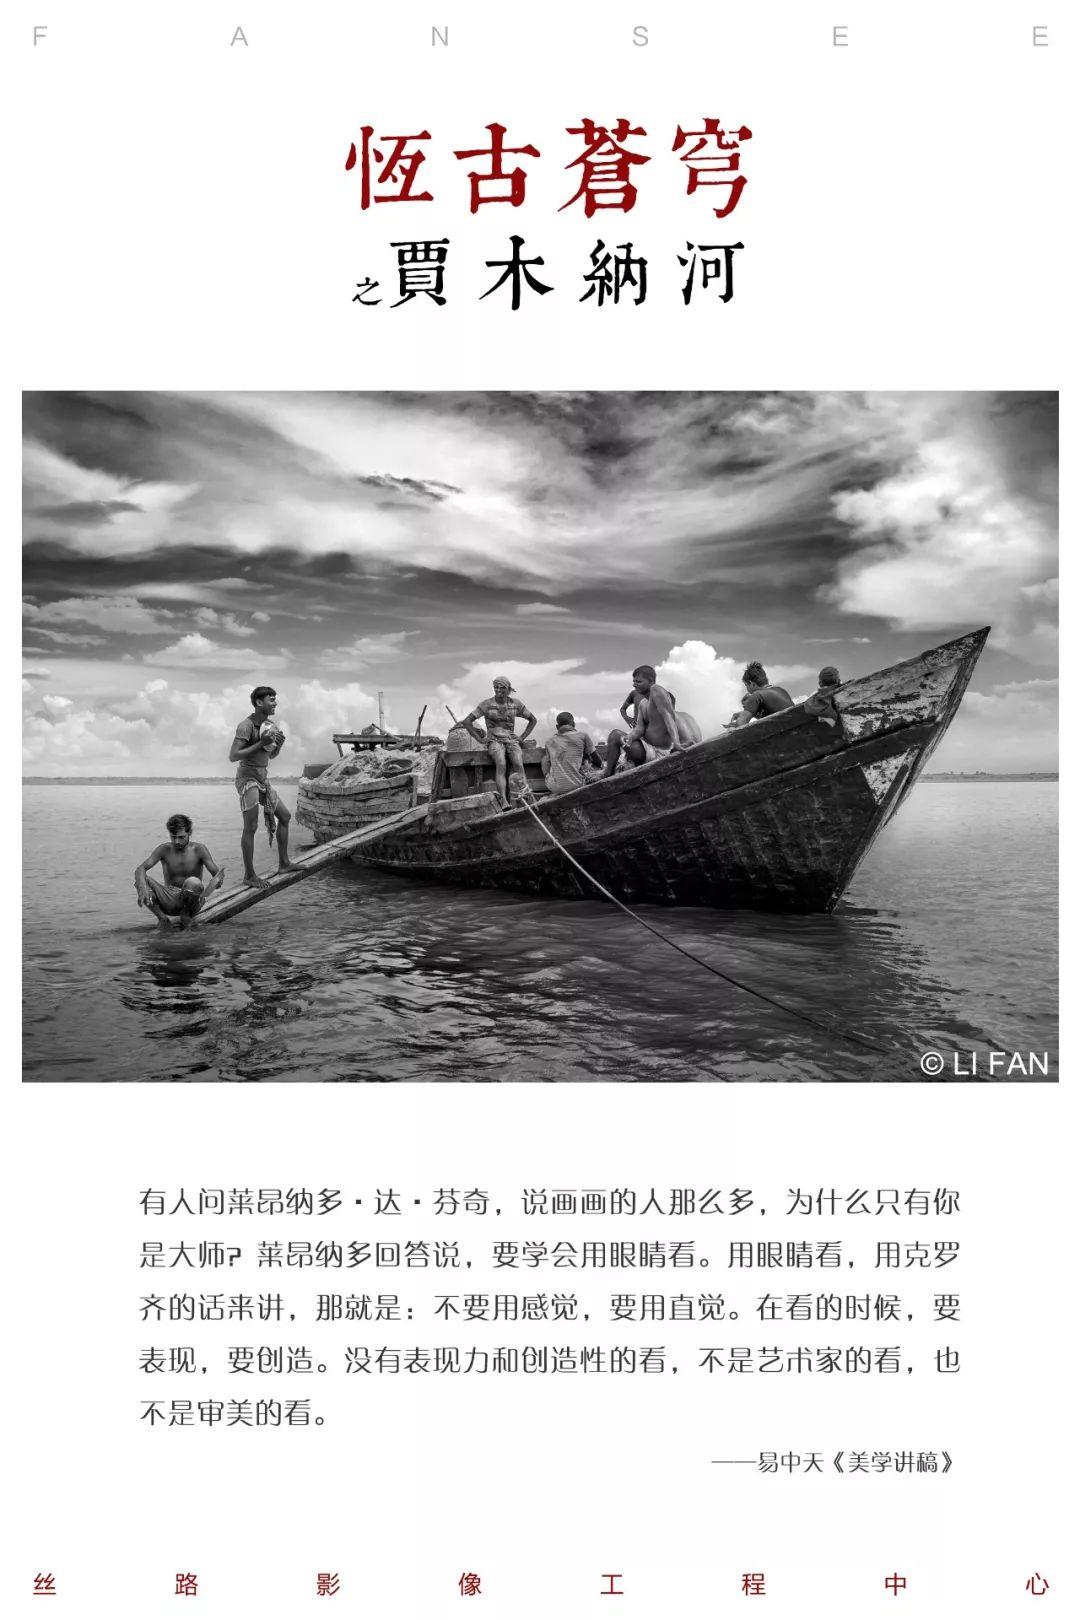 Li Fan | 贾木纳河:纸上观看的震撼